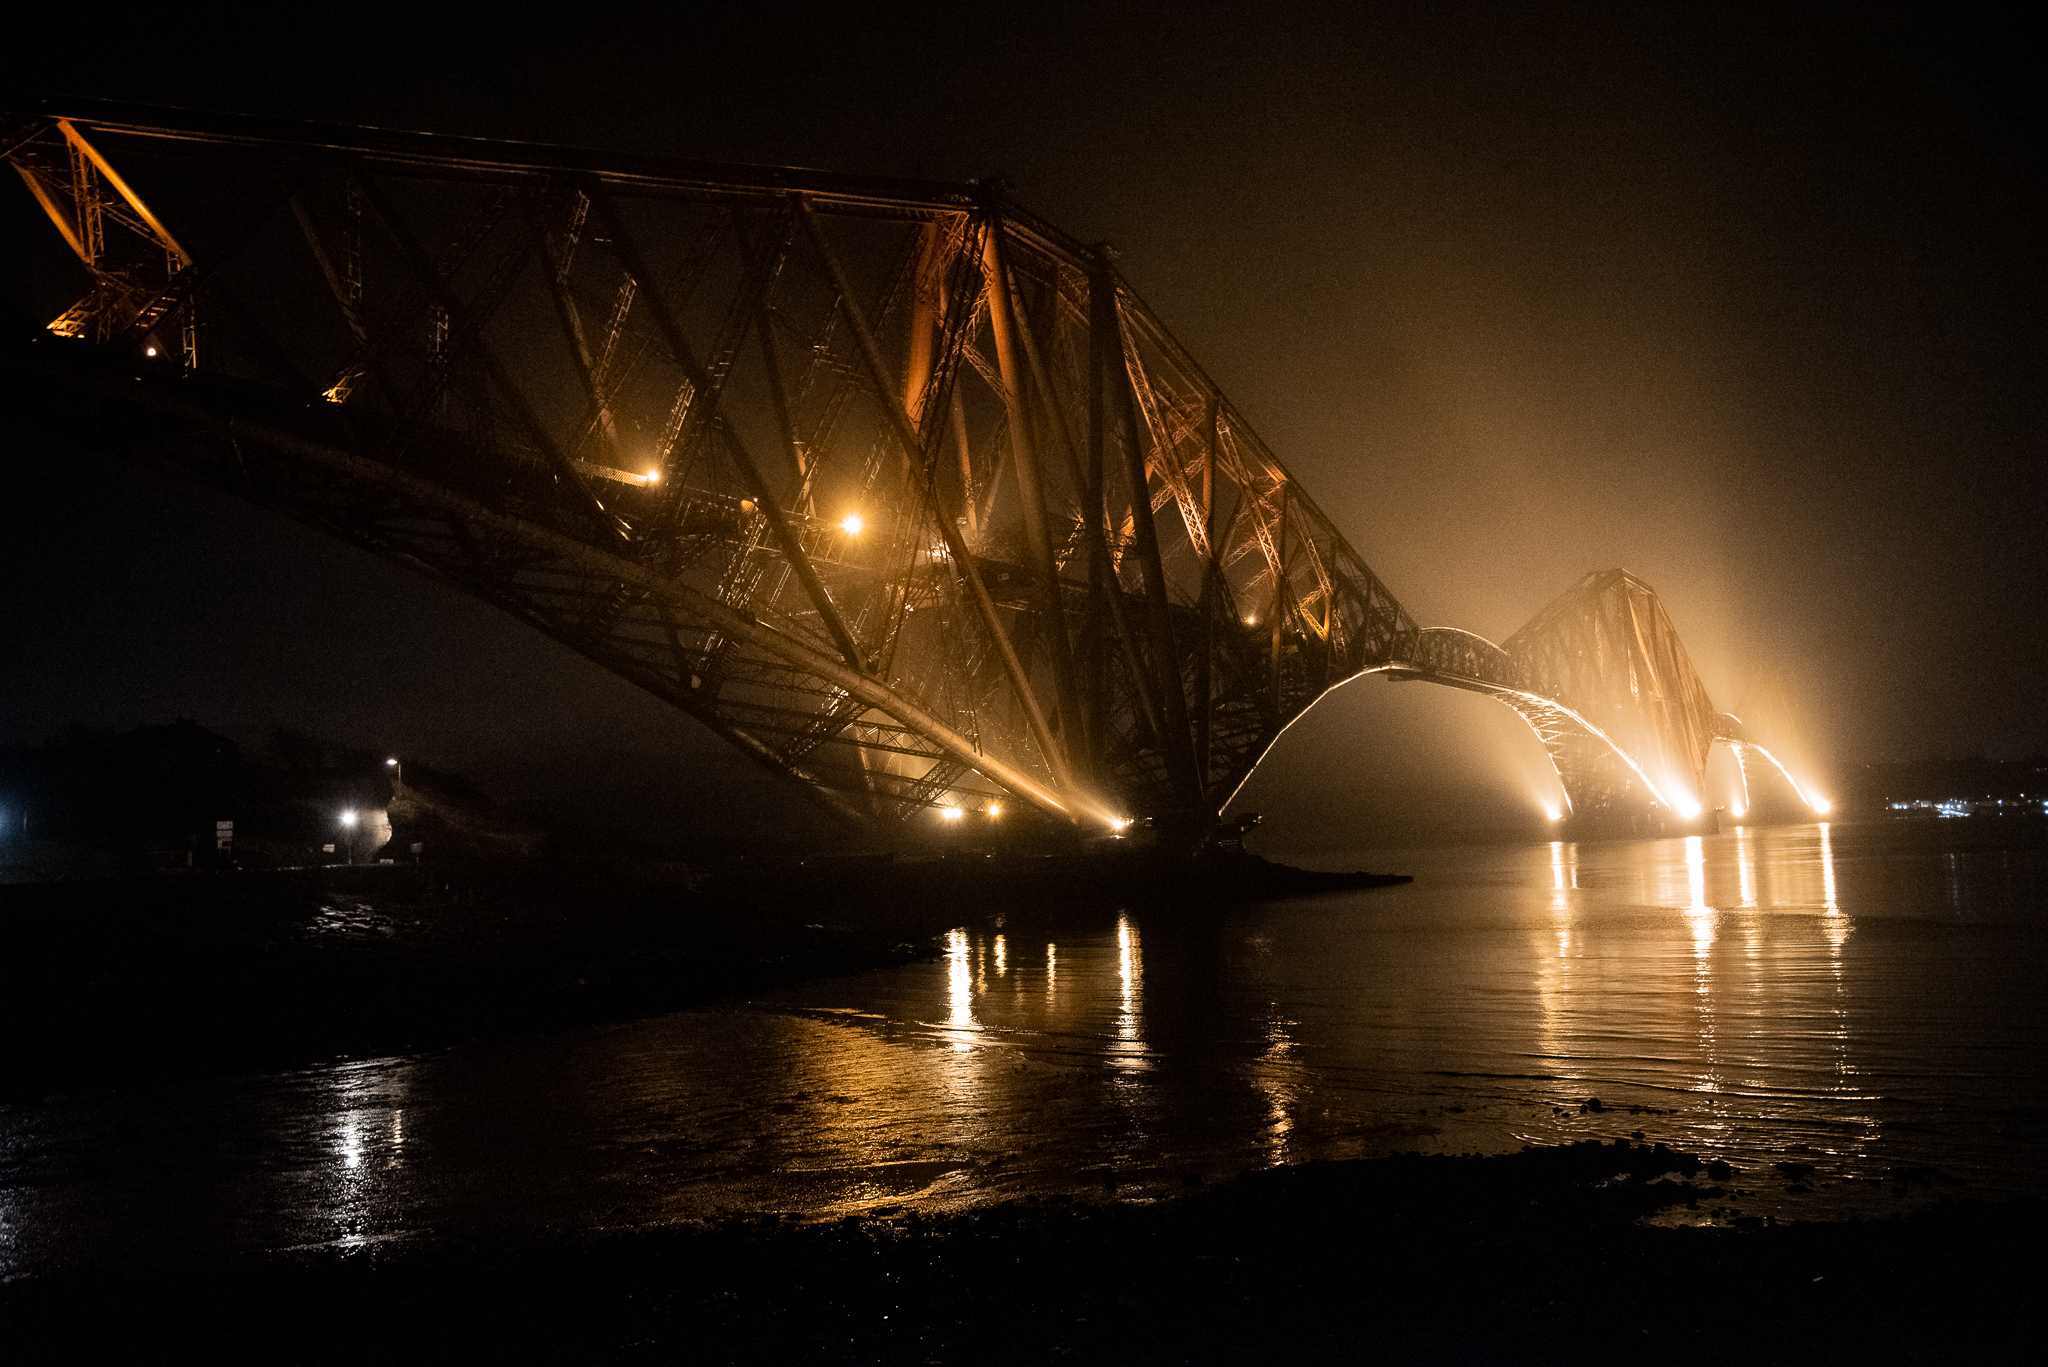 forth road bridge, east, edinburgh, scotland, night photography, bridge, architecture